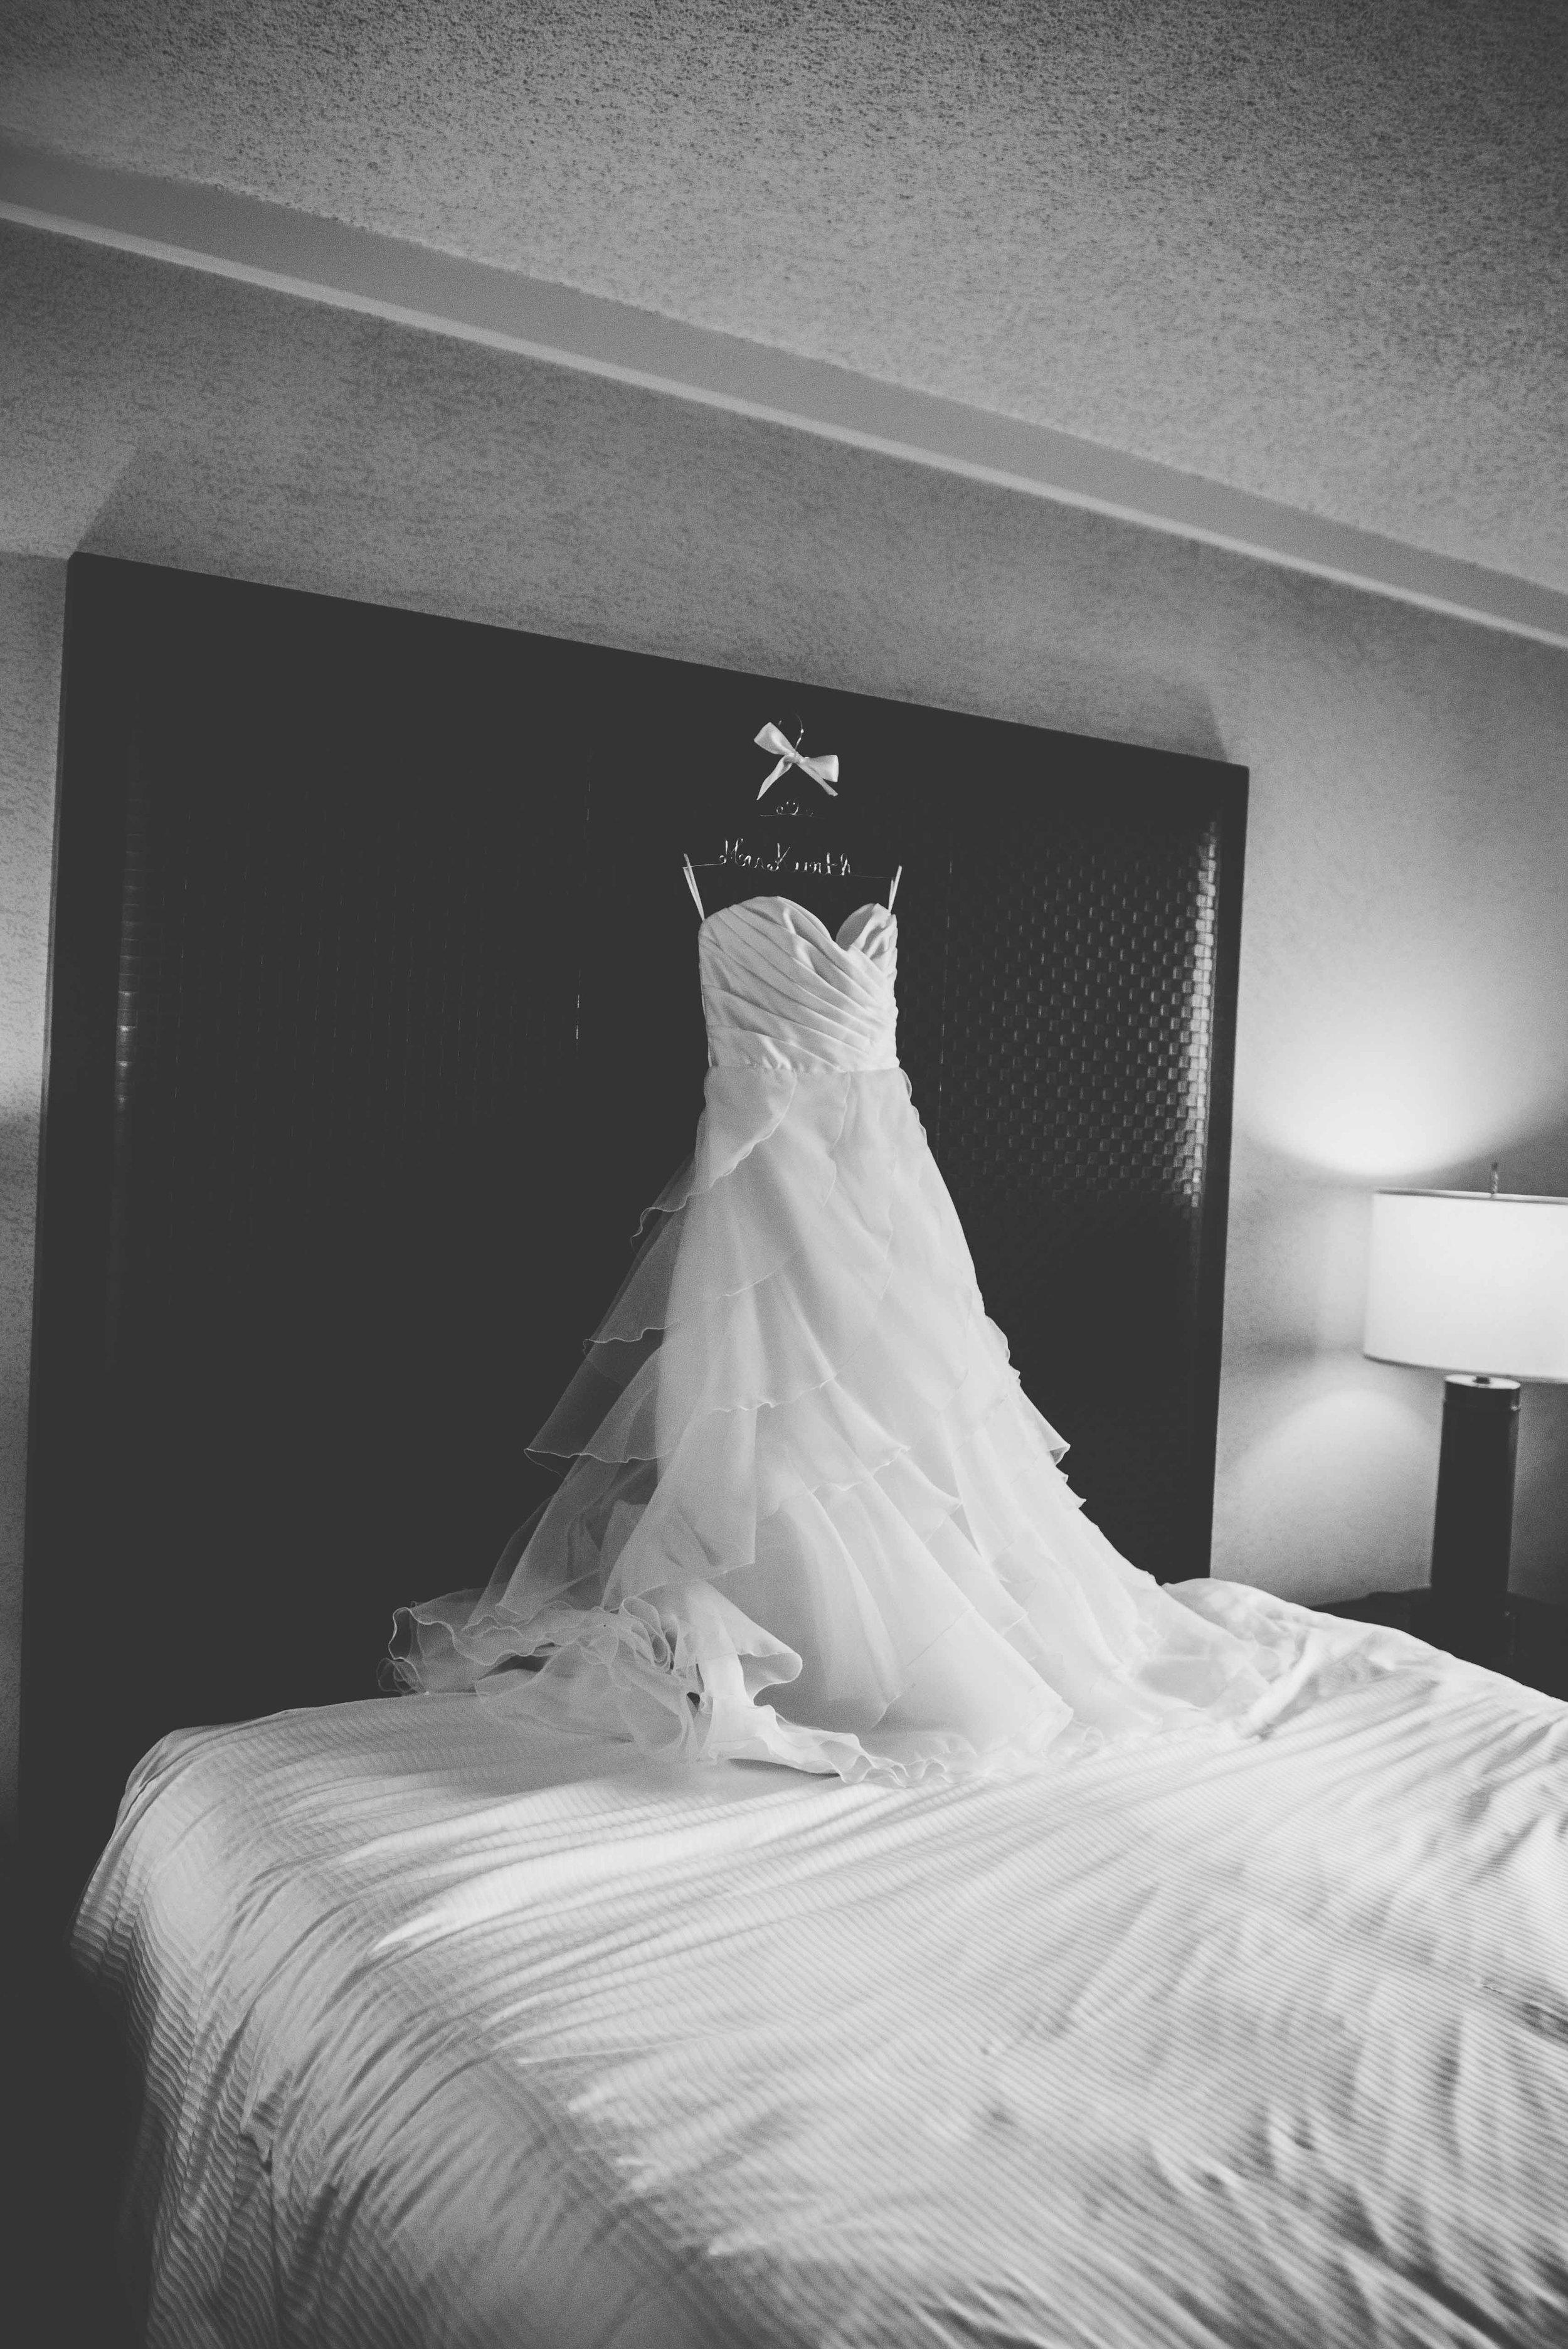 weddingwebsitesmallerpics-135.jpg